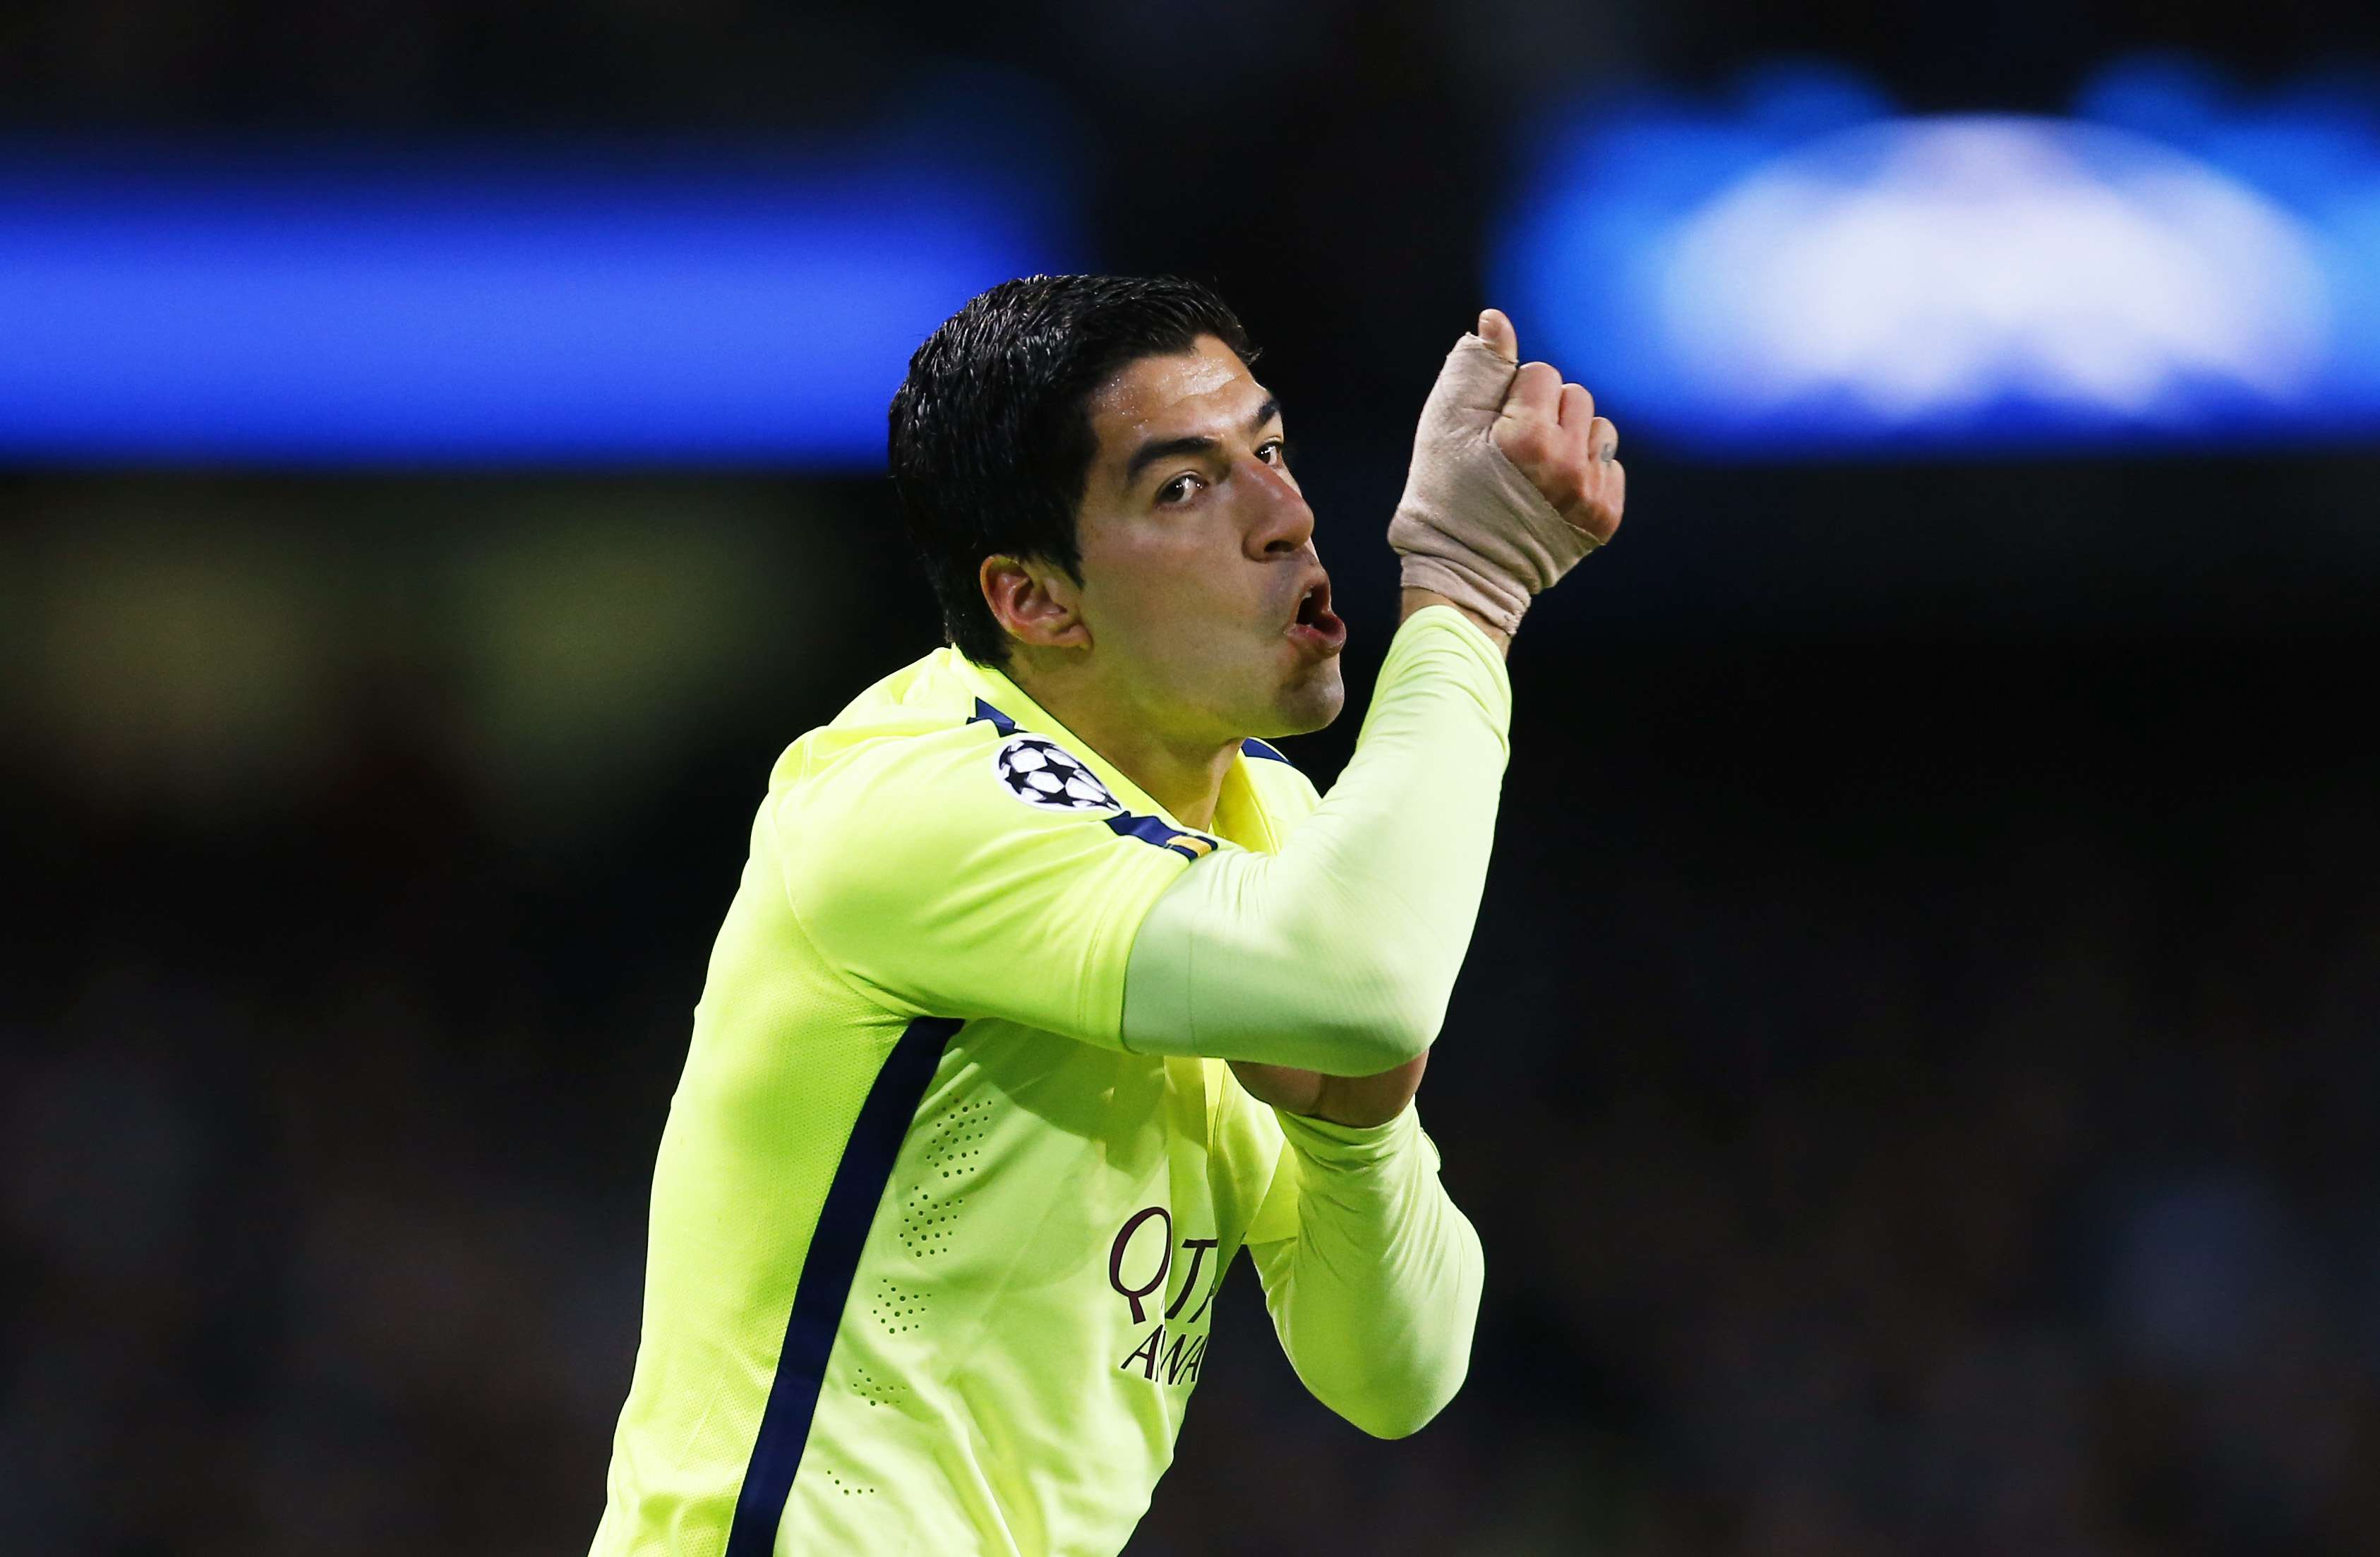 Luís Suárez se destacou pelo Barcelona na Inglaterra Foto: Darren Staples/Reuters